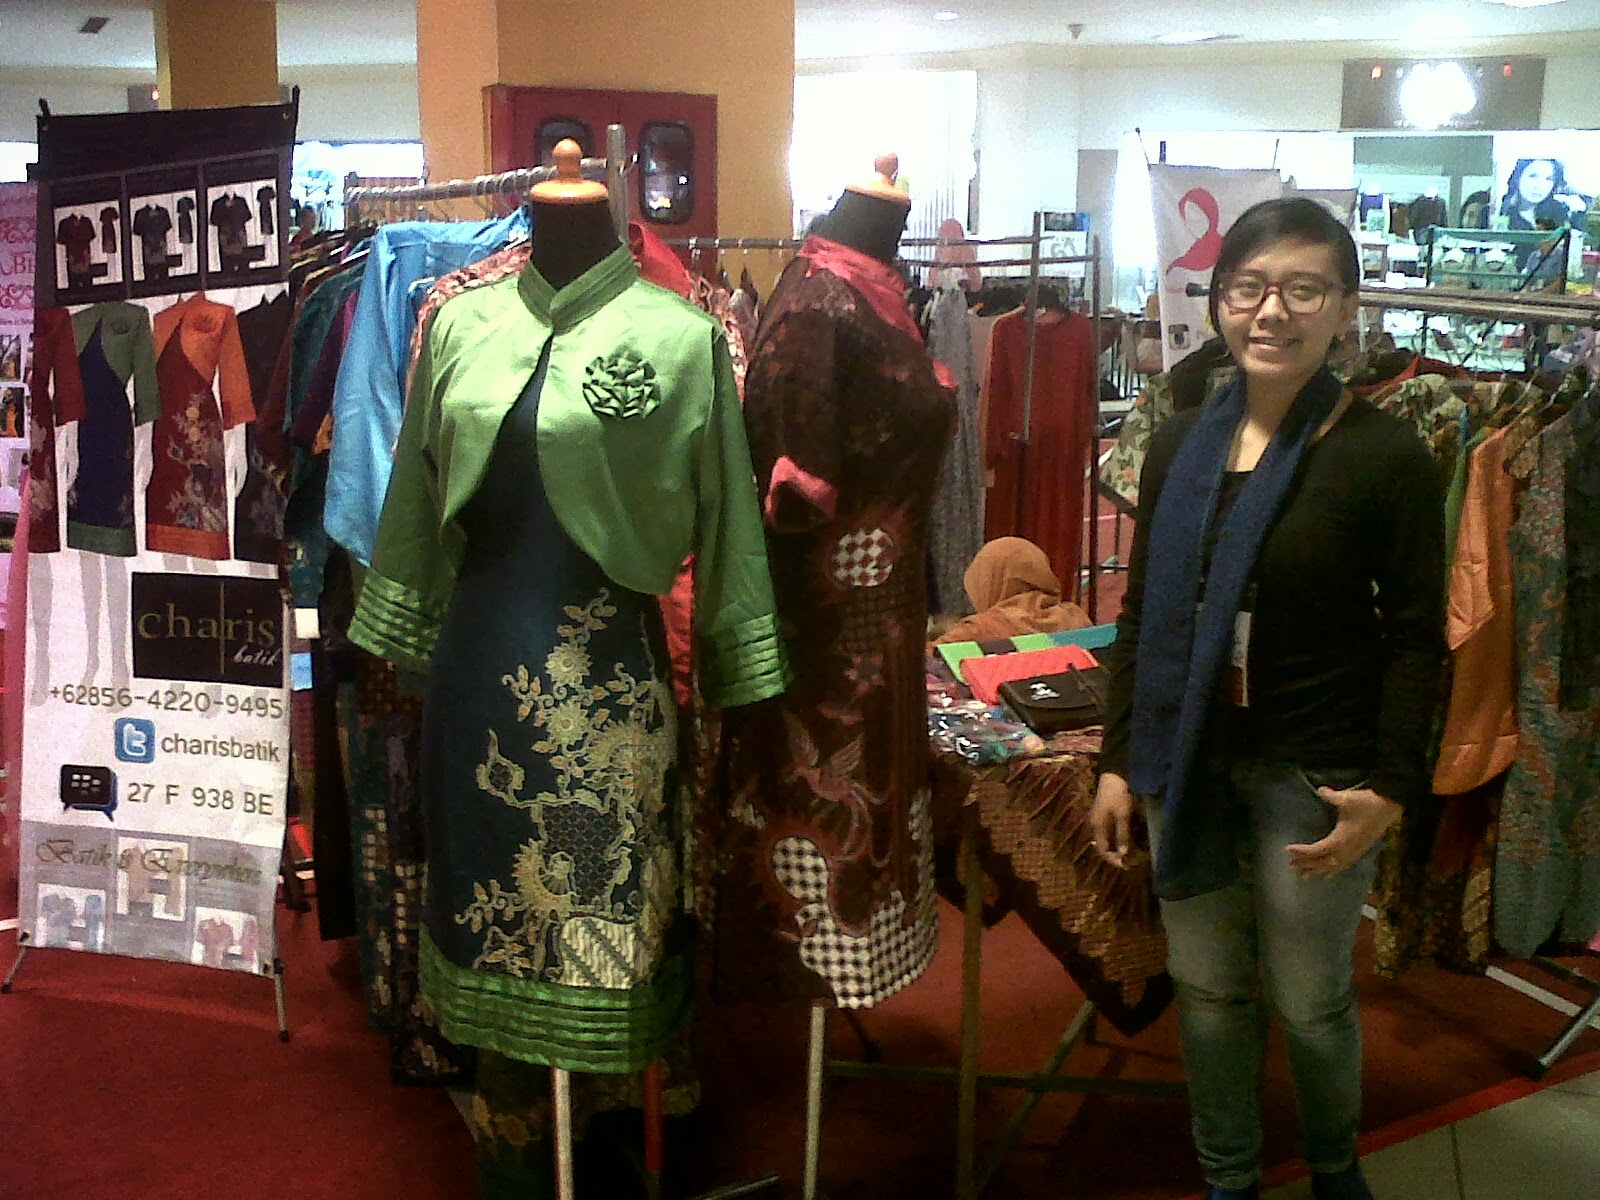 Charis Batik - Pameran Solo Grand Mall 12- 14 Oktober 2013 | Sara ...